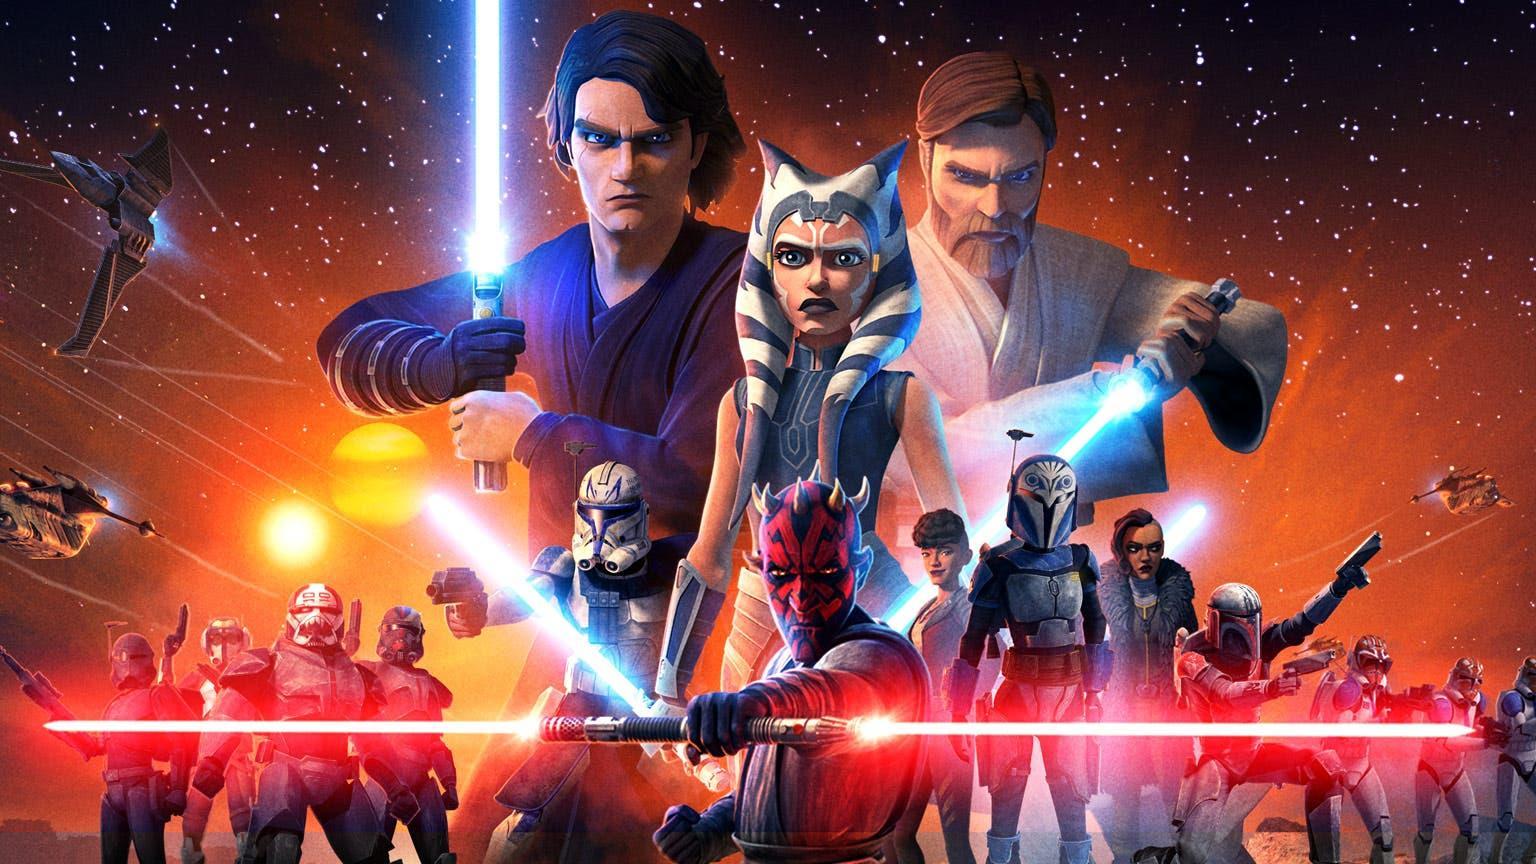 Star Wars The Clone Wars: Voici à Quoi Ressemblerait Darth